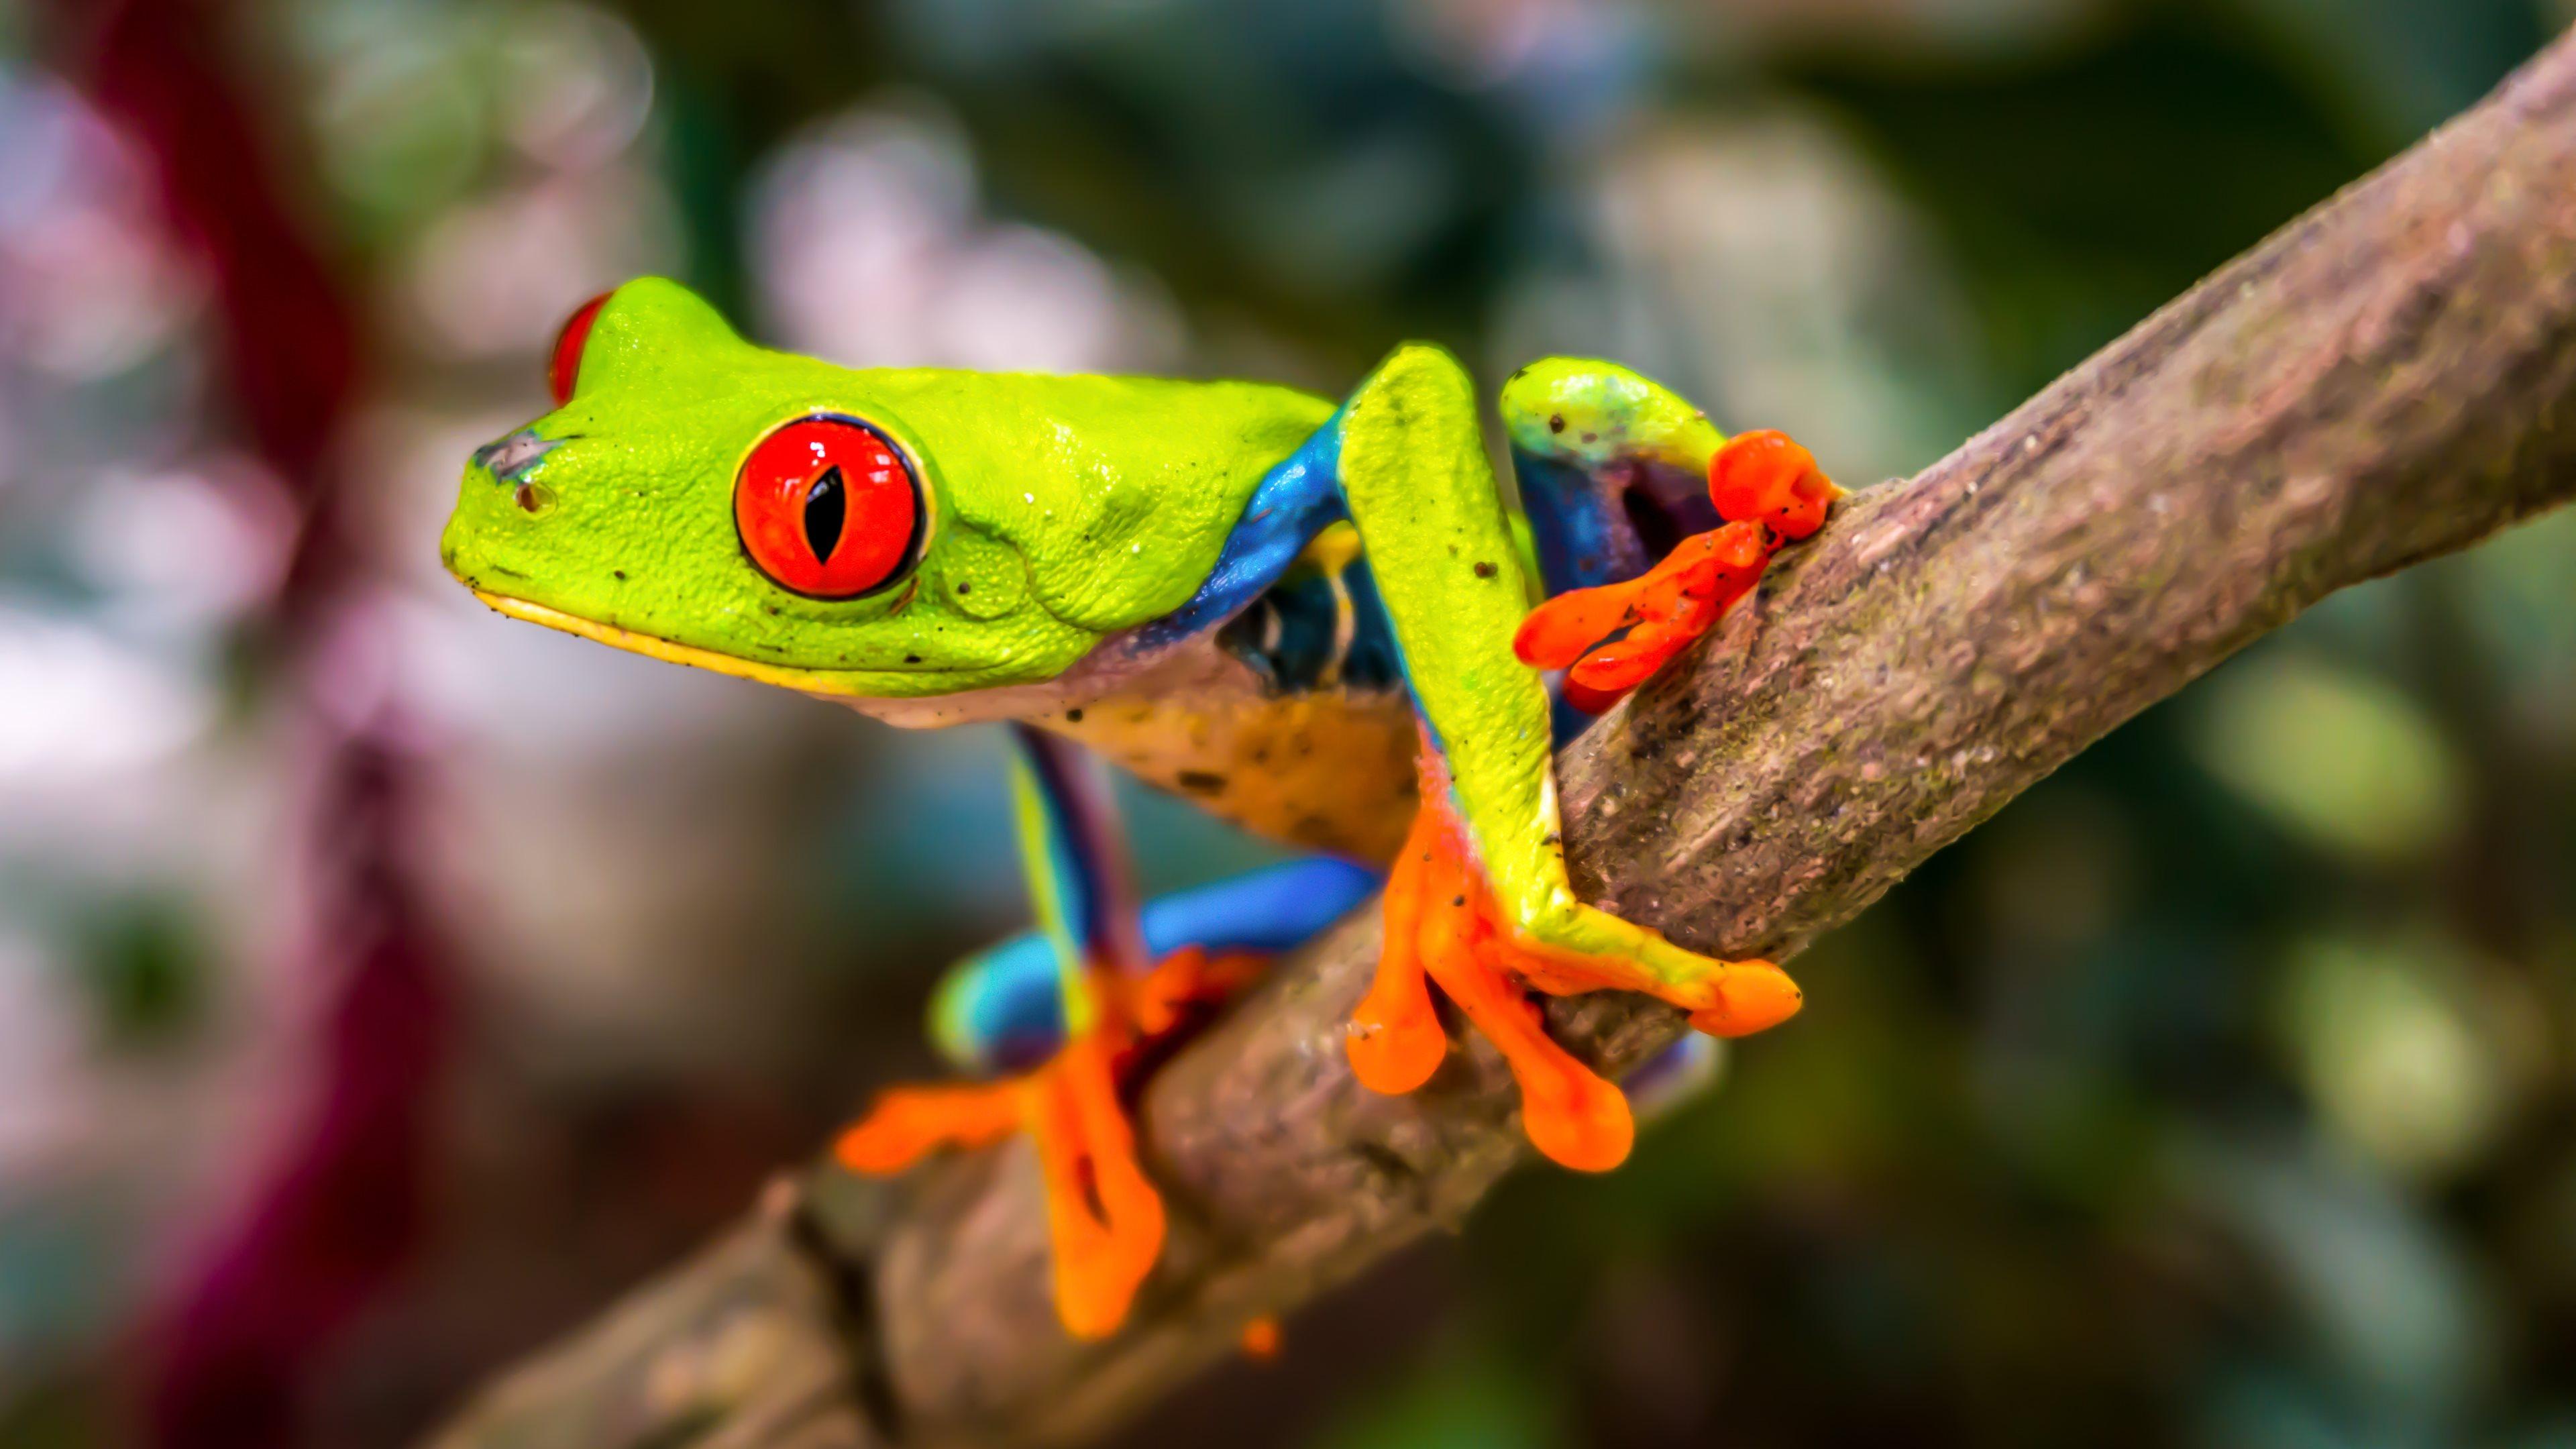 Red eyed tree frog tadpole - photo#25